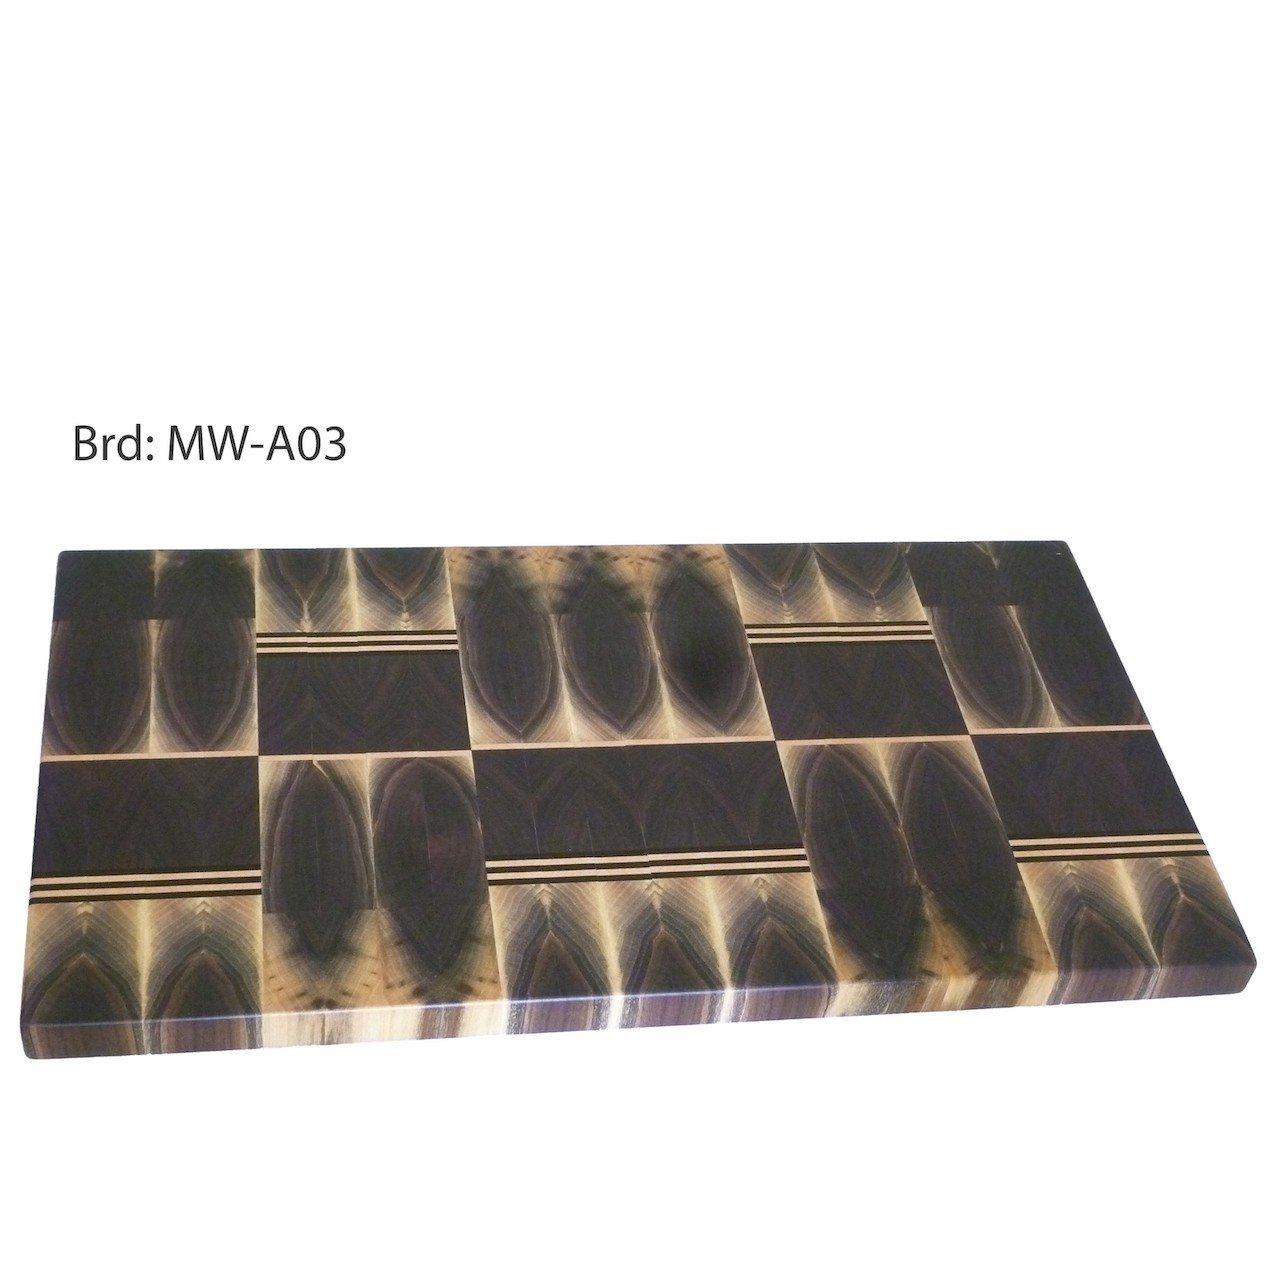 MW-A03